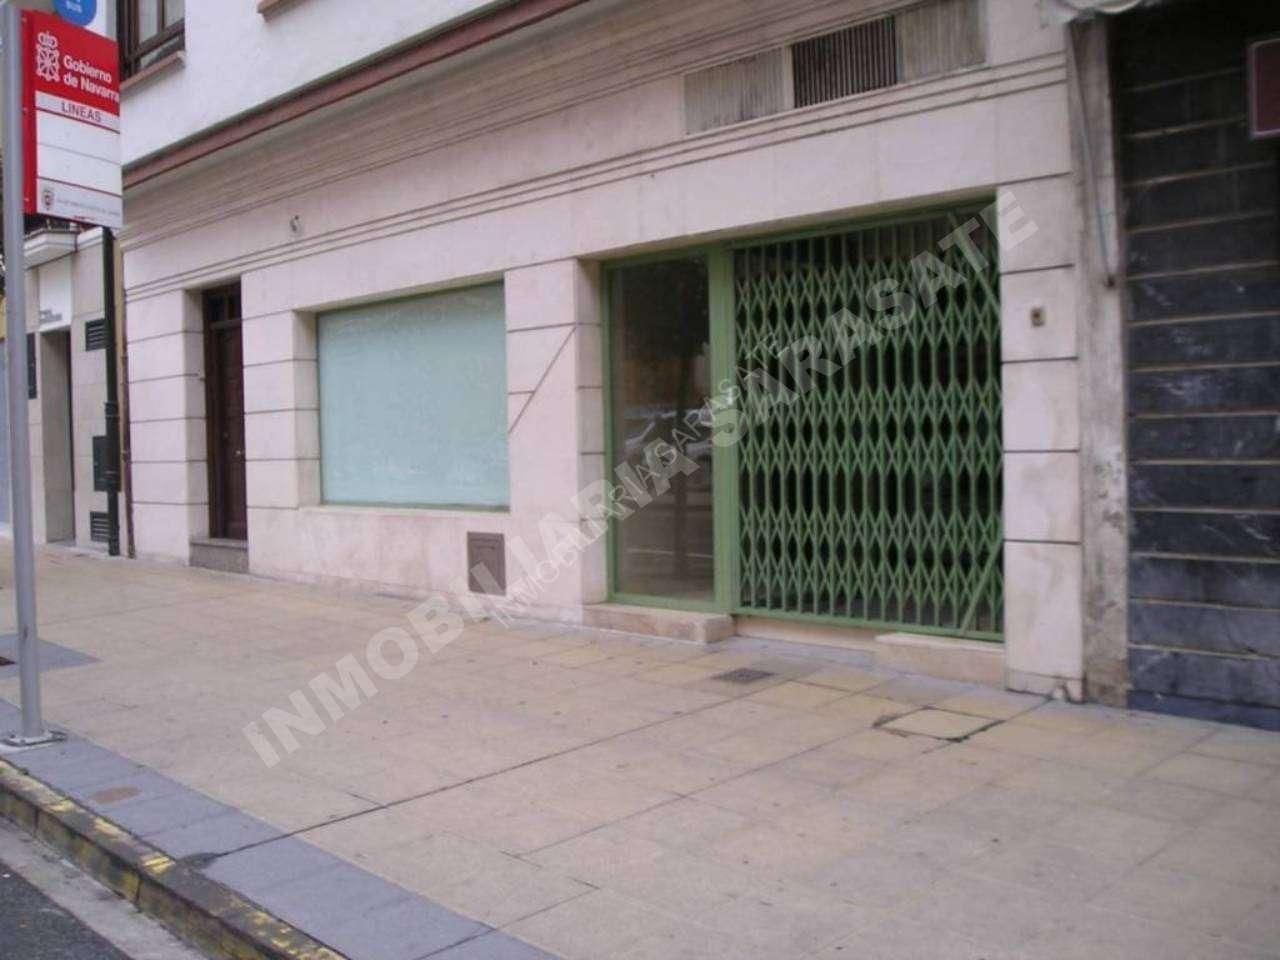 ALQUILER DE LOCAL COMERCIAL EN CALLE PASEO INMACULADA, ESTELLA-LIZARRA | REF. (000501)